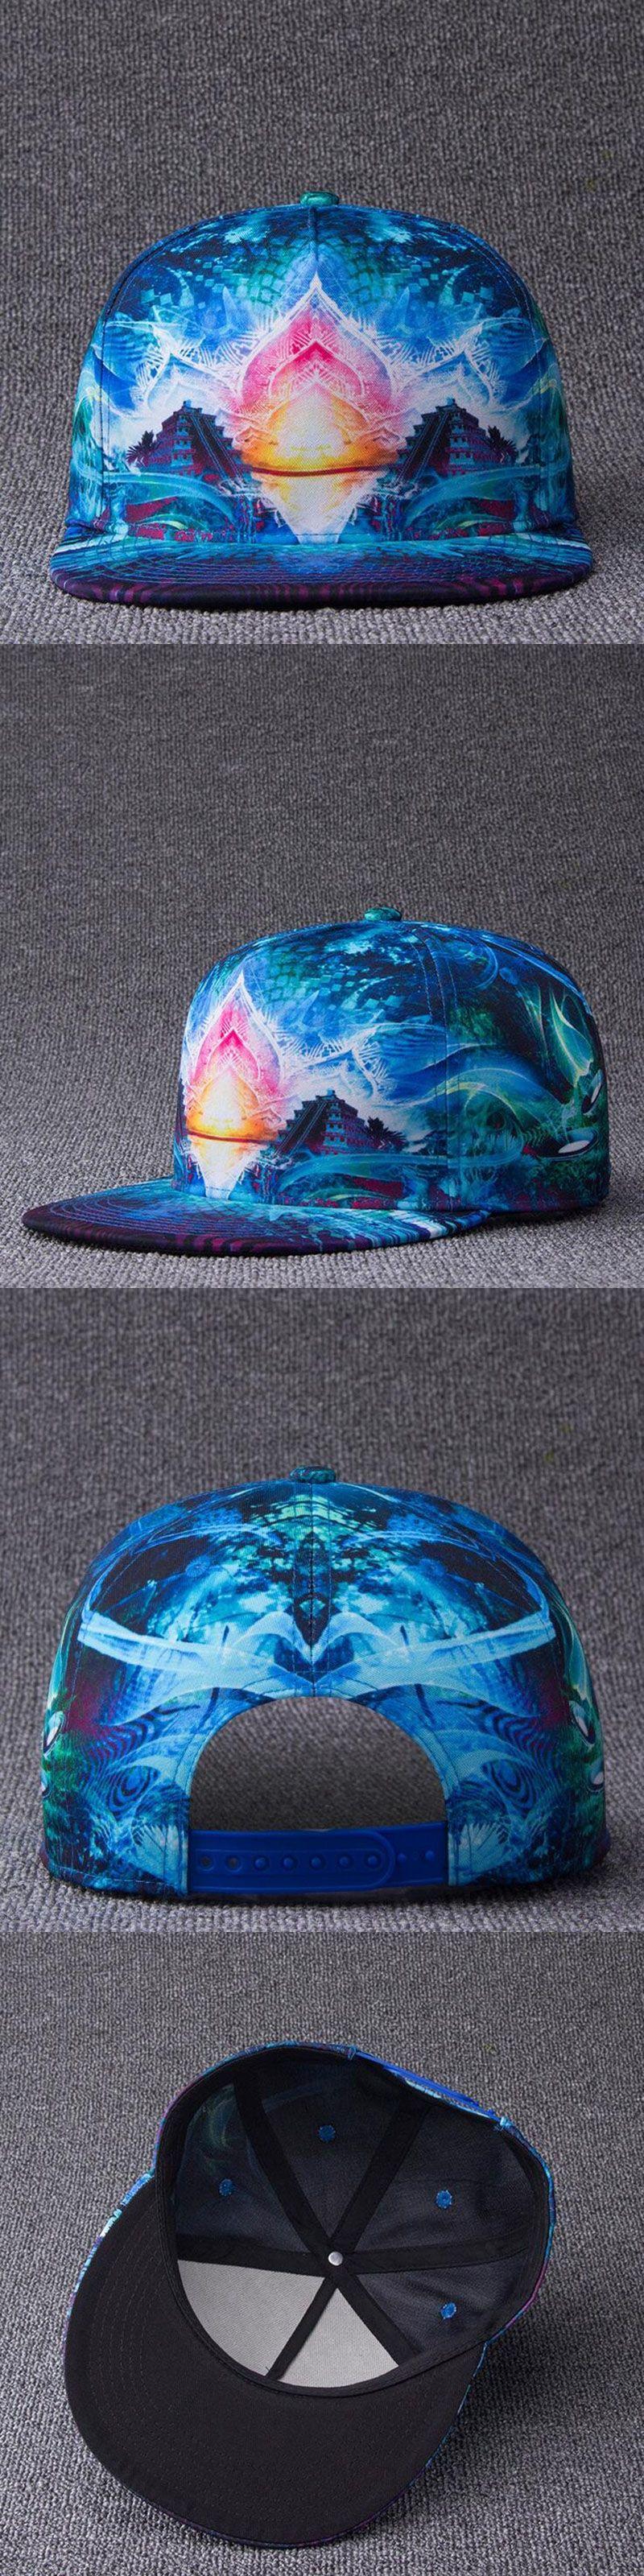 Snapback Gorras Hat Bon Flat Brimmed Men Baseball Cap Fashion 3D Print  Adjustable Hater Raiders women f4e3bd3dee8